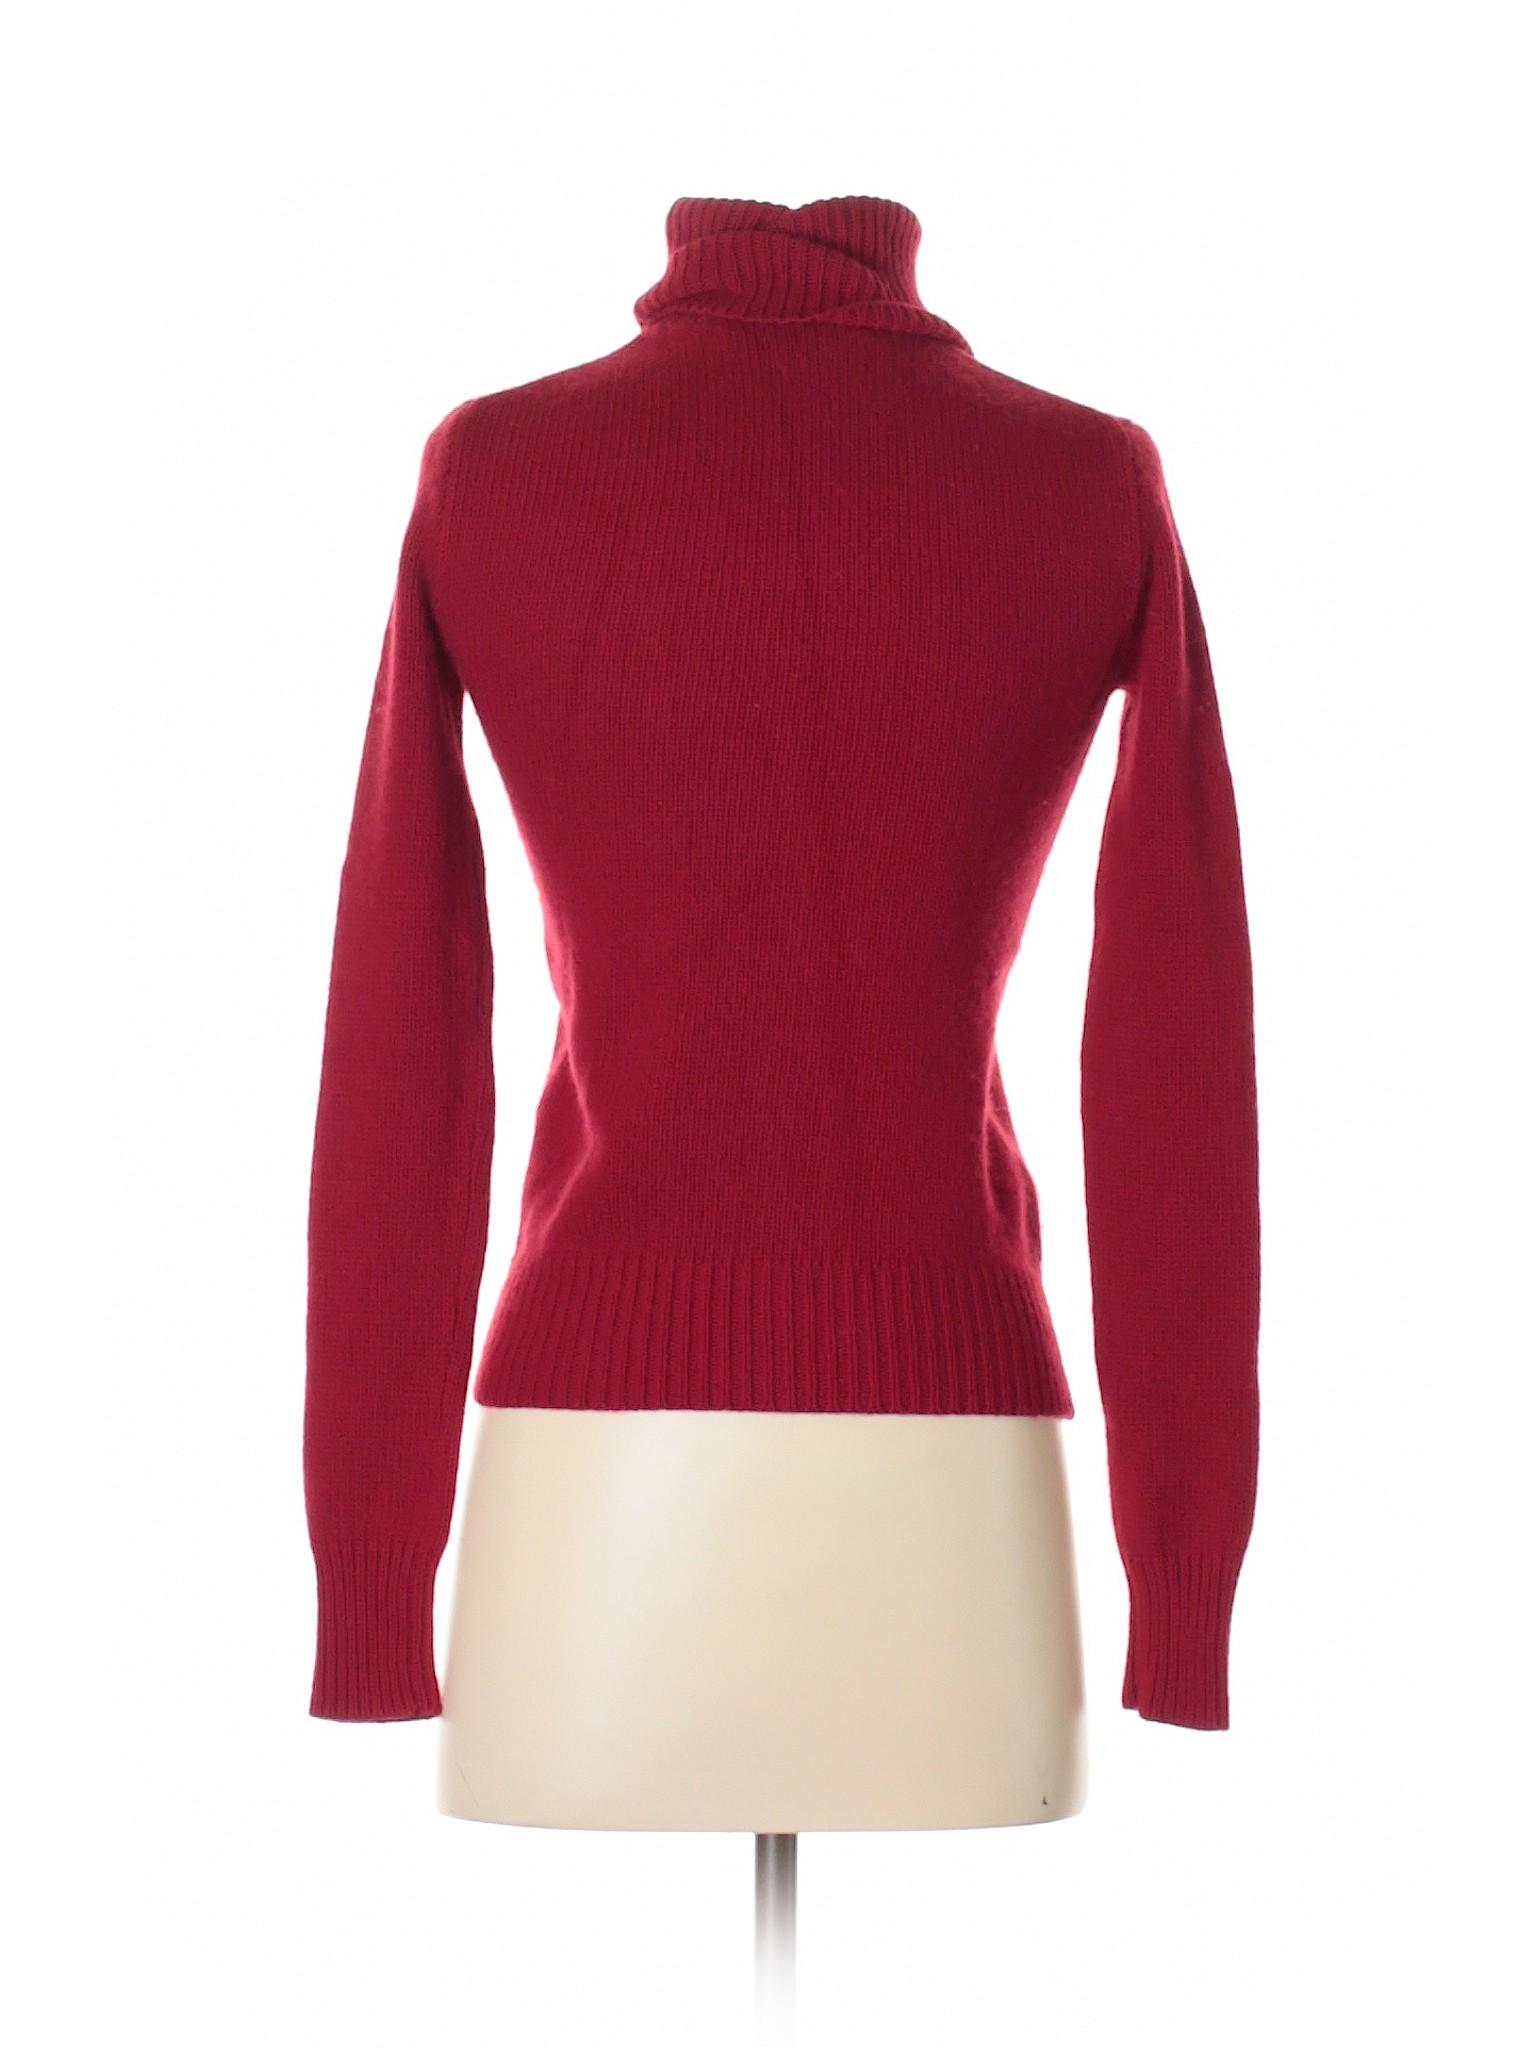 Cashmere Lauren Pullover Sweater Ralph Boutique qvSxwg5